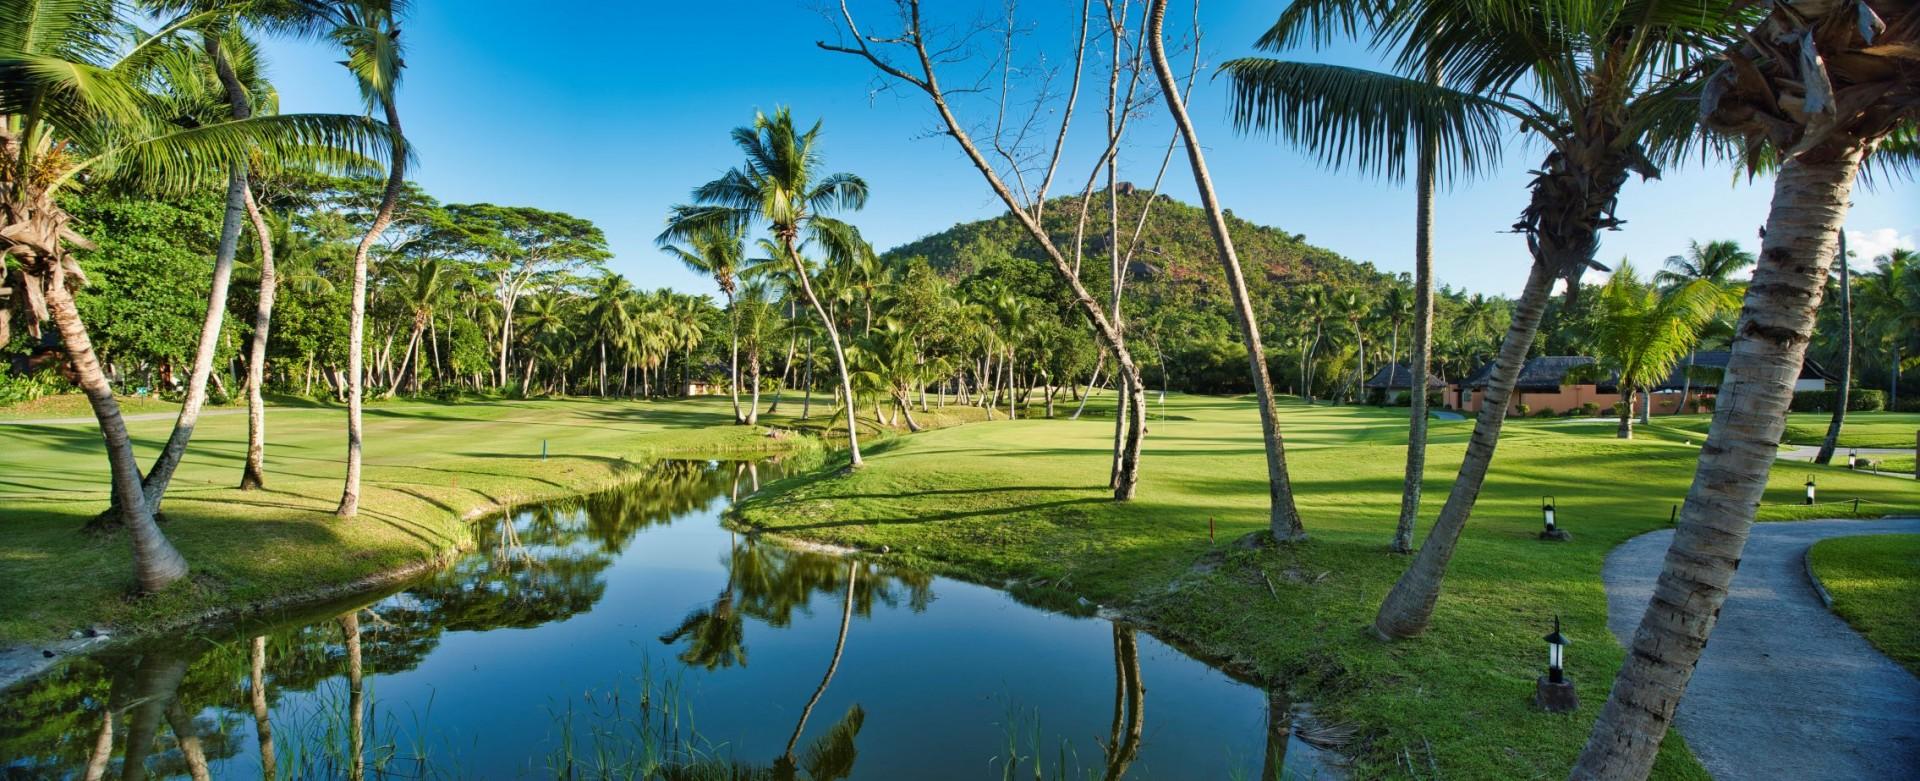 lemuria-seychelles-2019-jt-golf-16_hd1